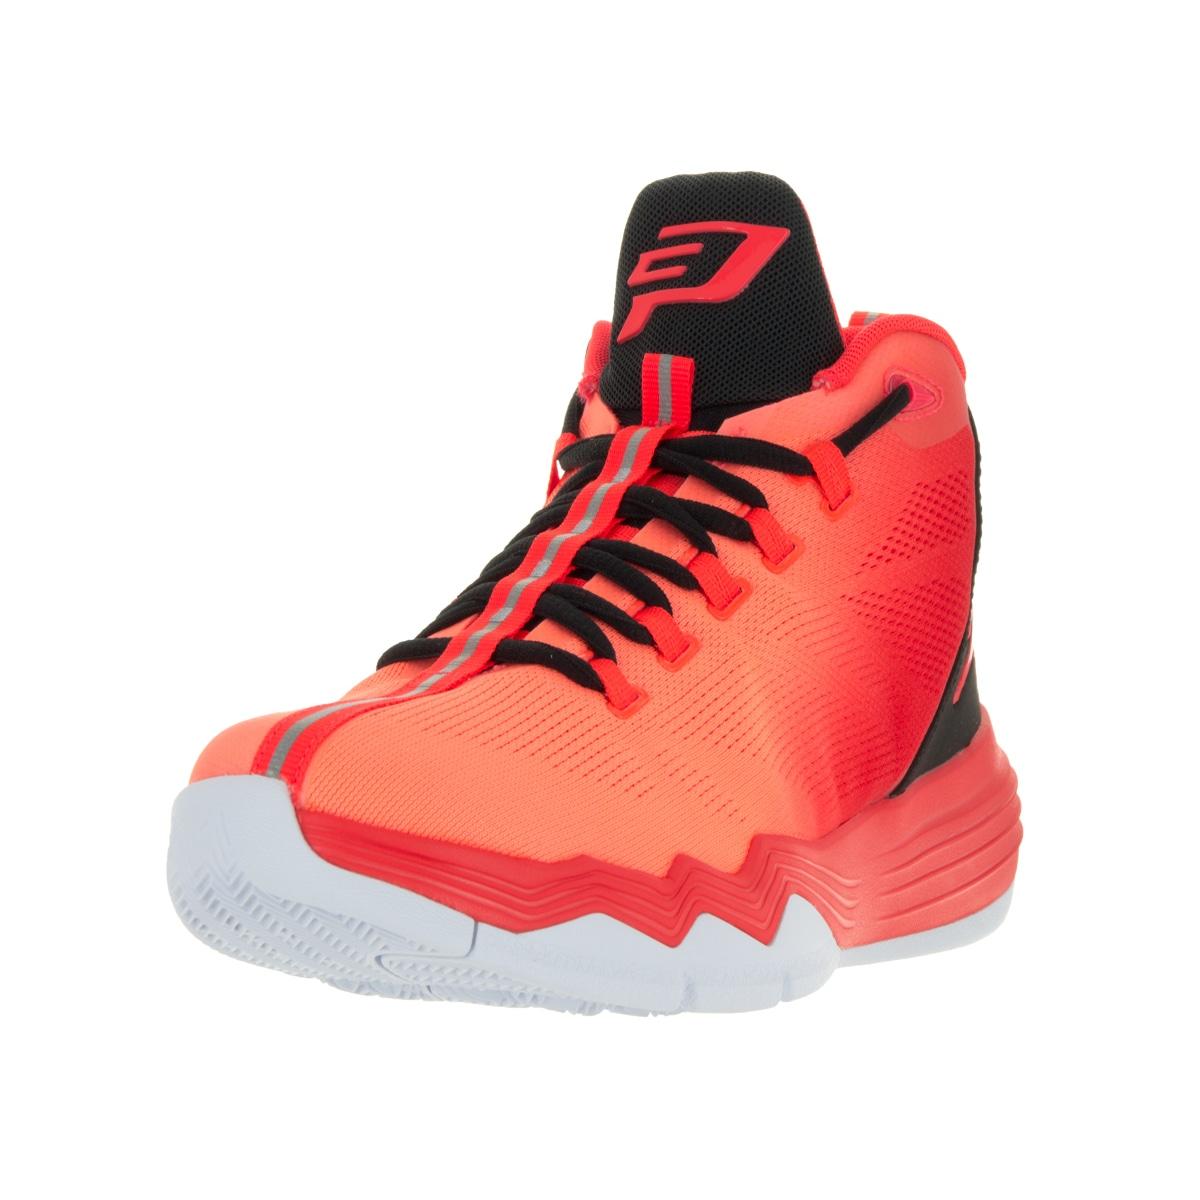 Nike Jordan Men's Jordan CP3.IX AE Infrrd 23/Infrrd 23 Bl...